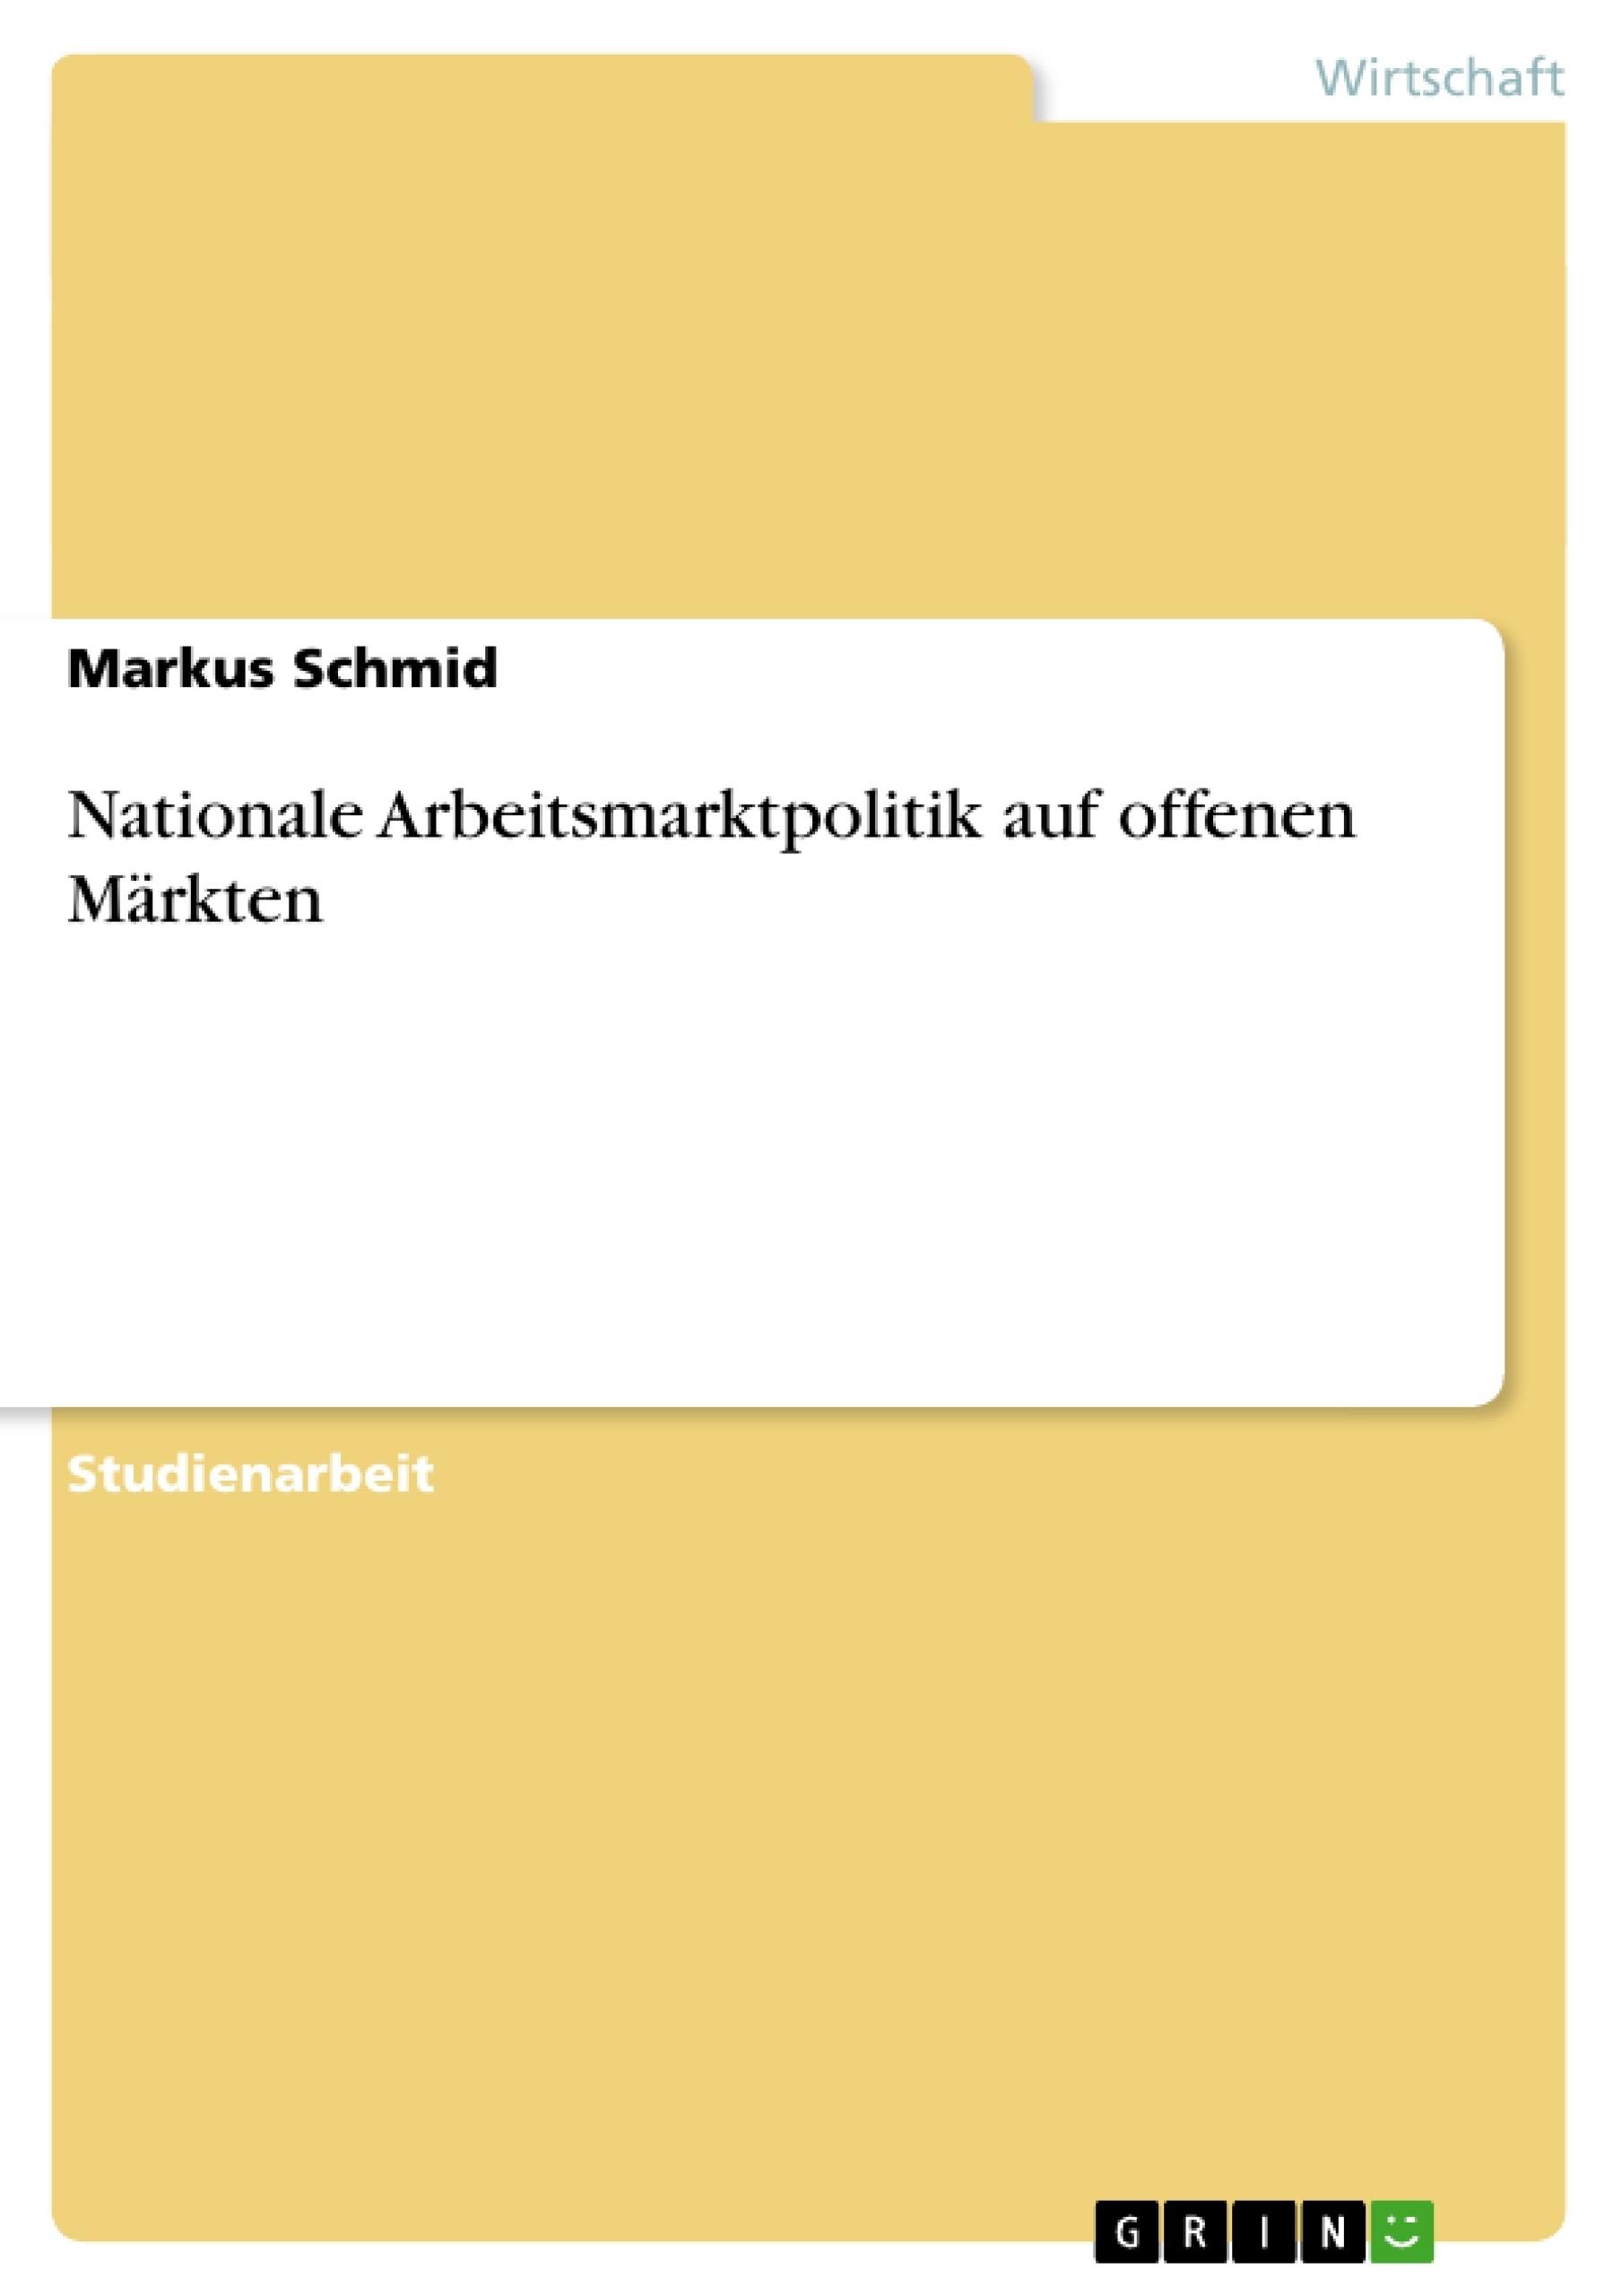 Titel: Nationale Arbeitsmarktpolitik auf offenen Märkten